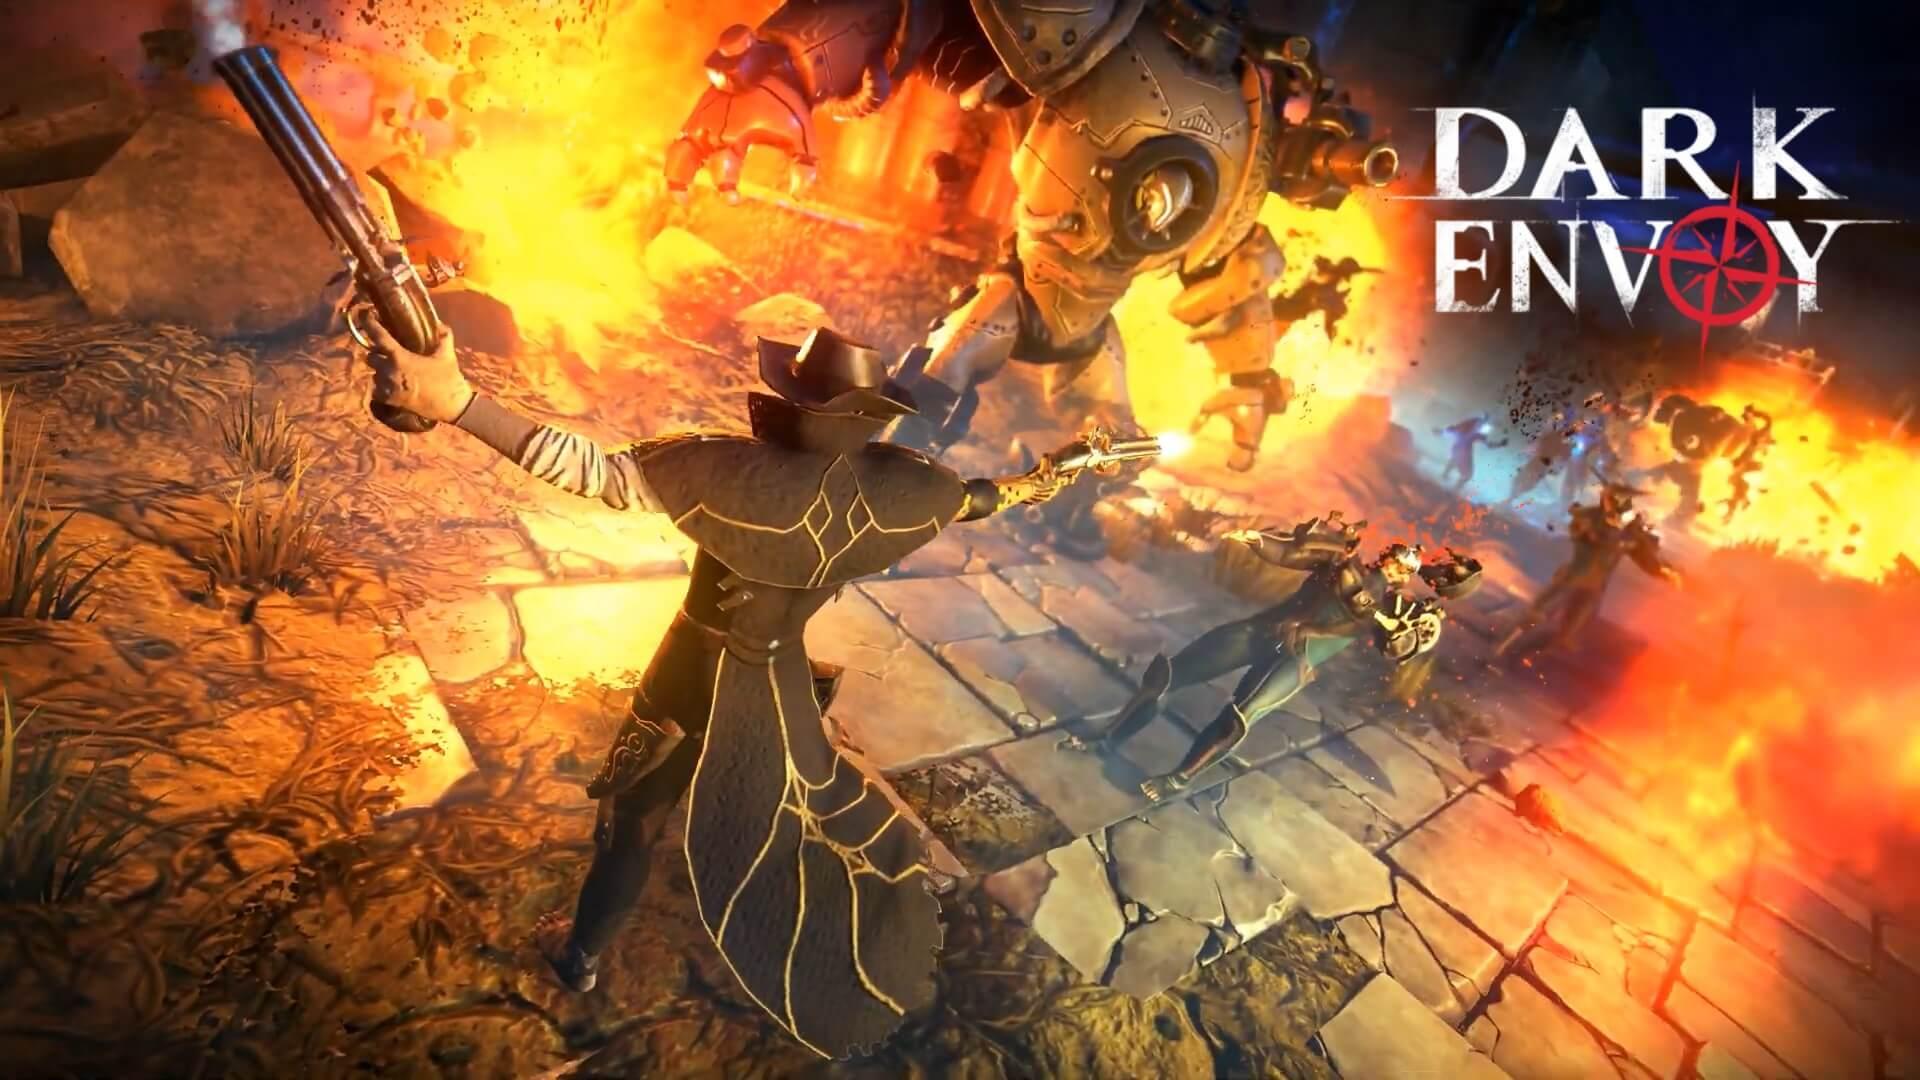 Dark Envoy shares trailer for upcoming sci-fi RPG game